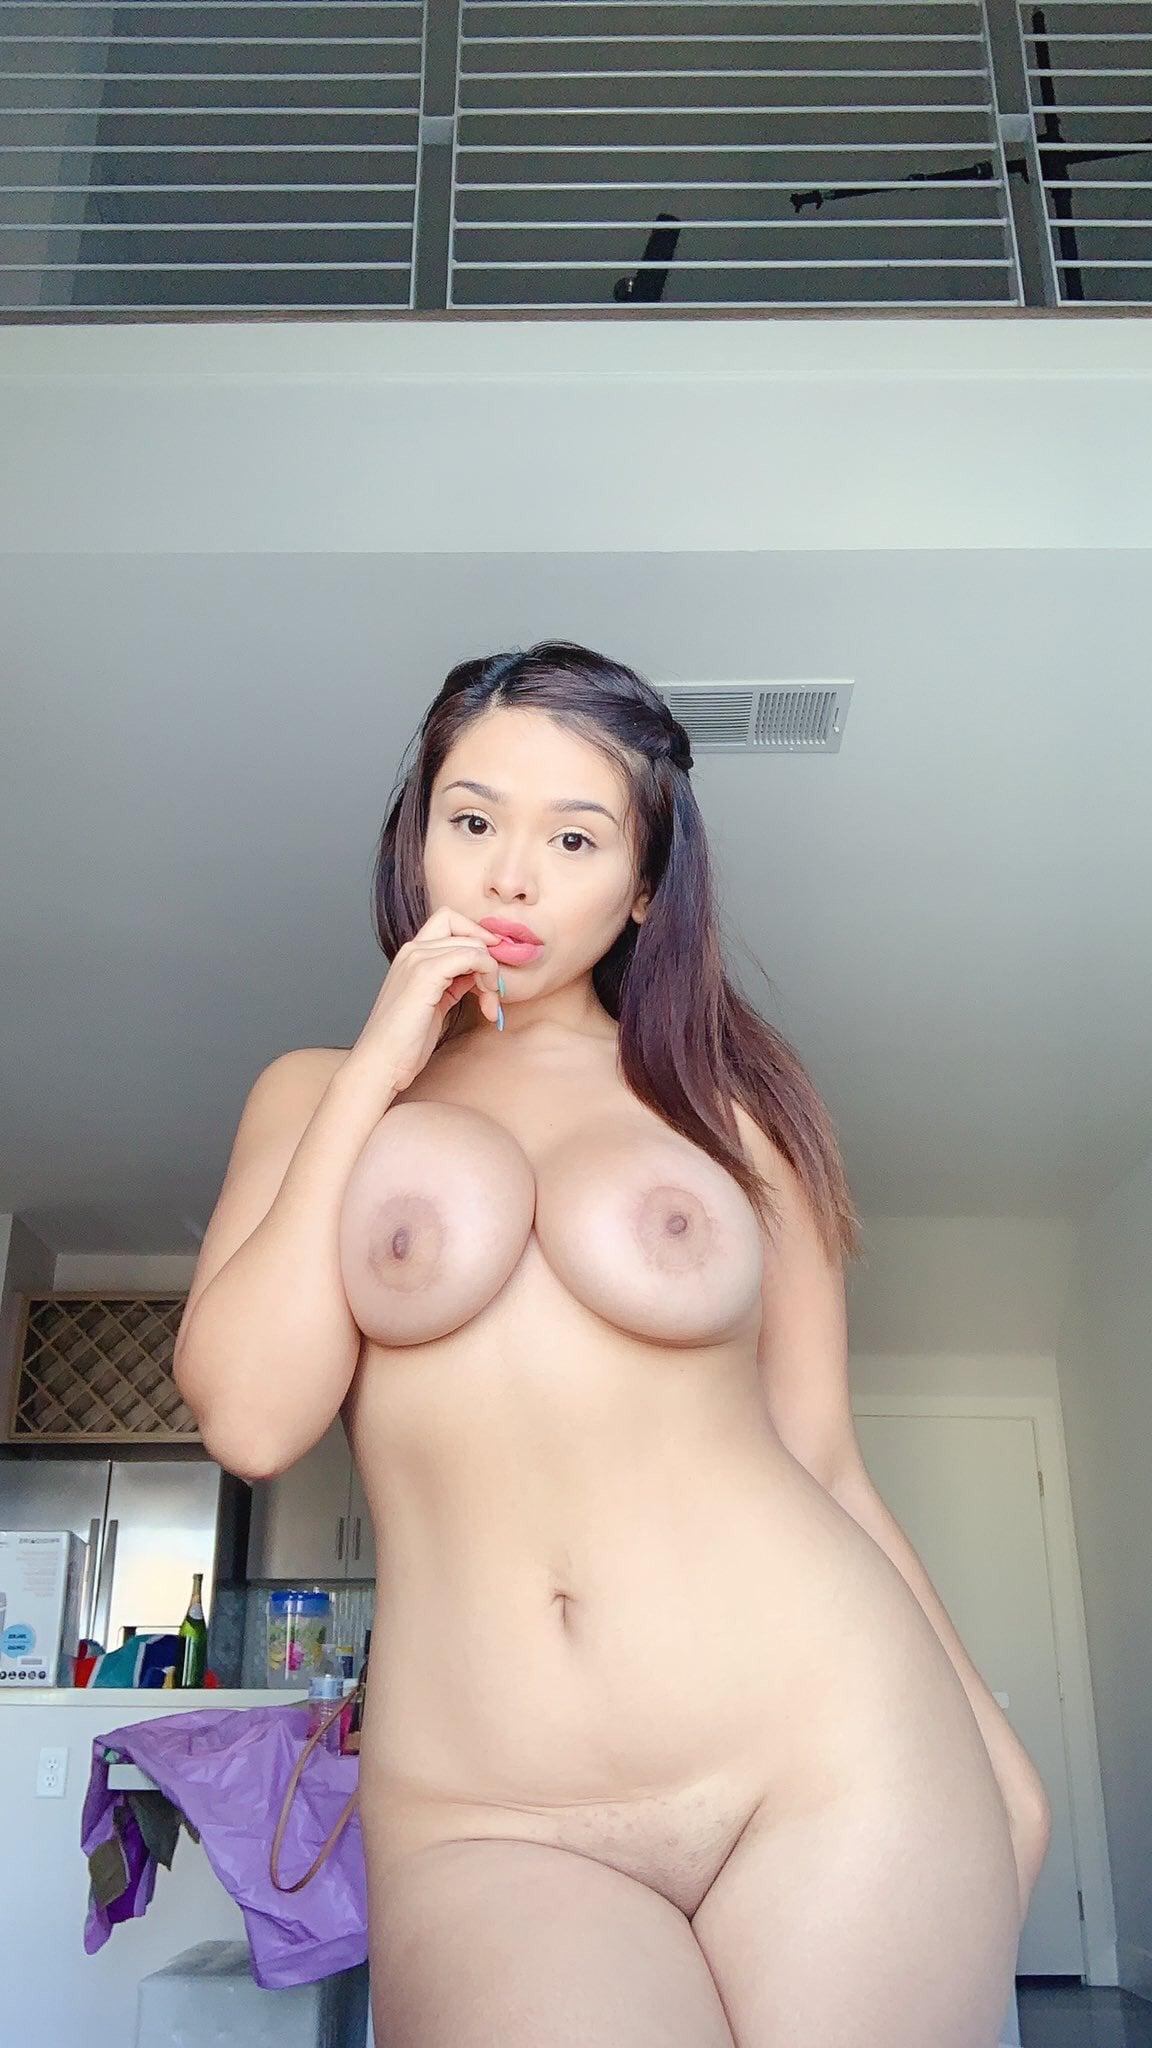 Alvajay Reddit Nude photo 2